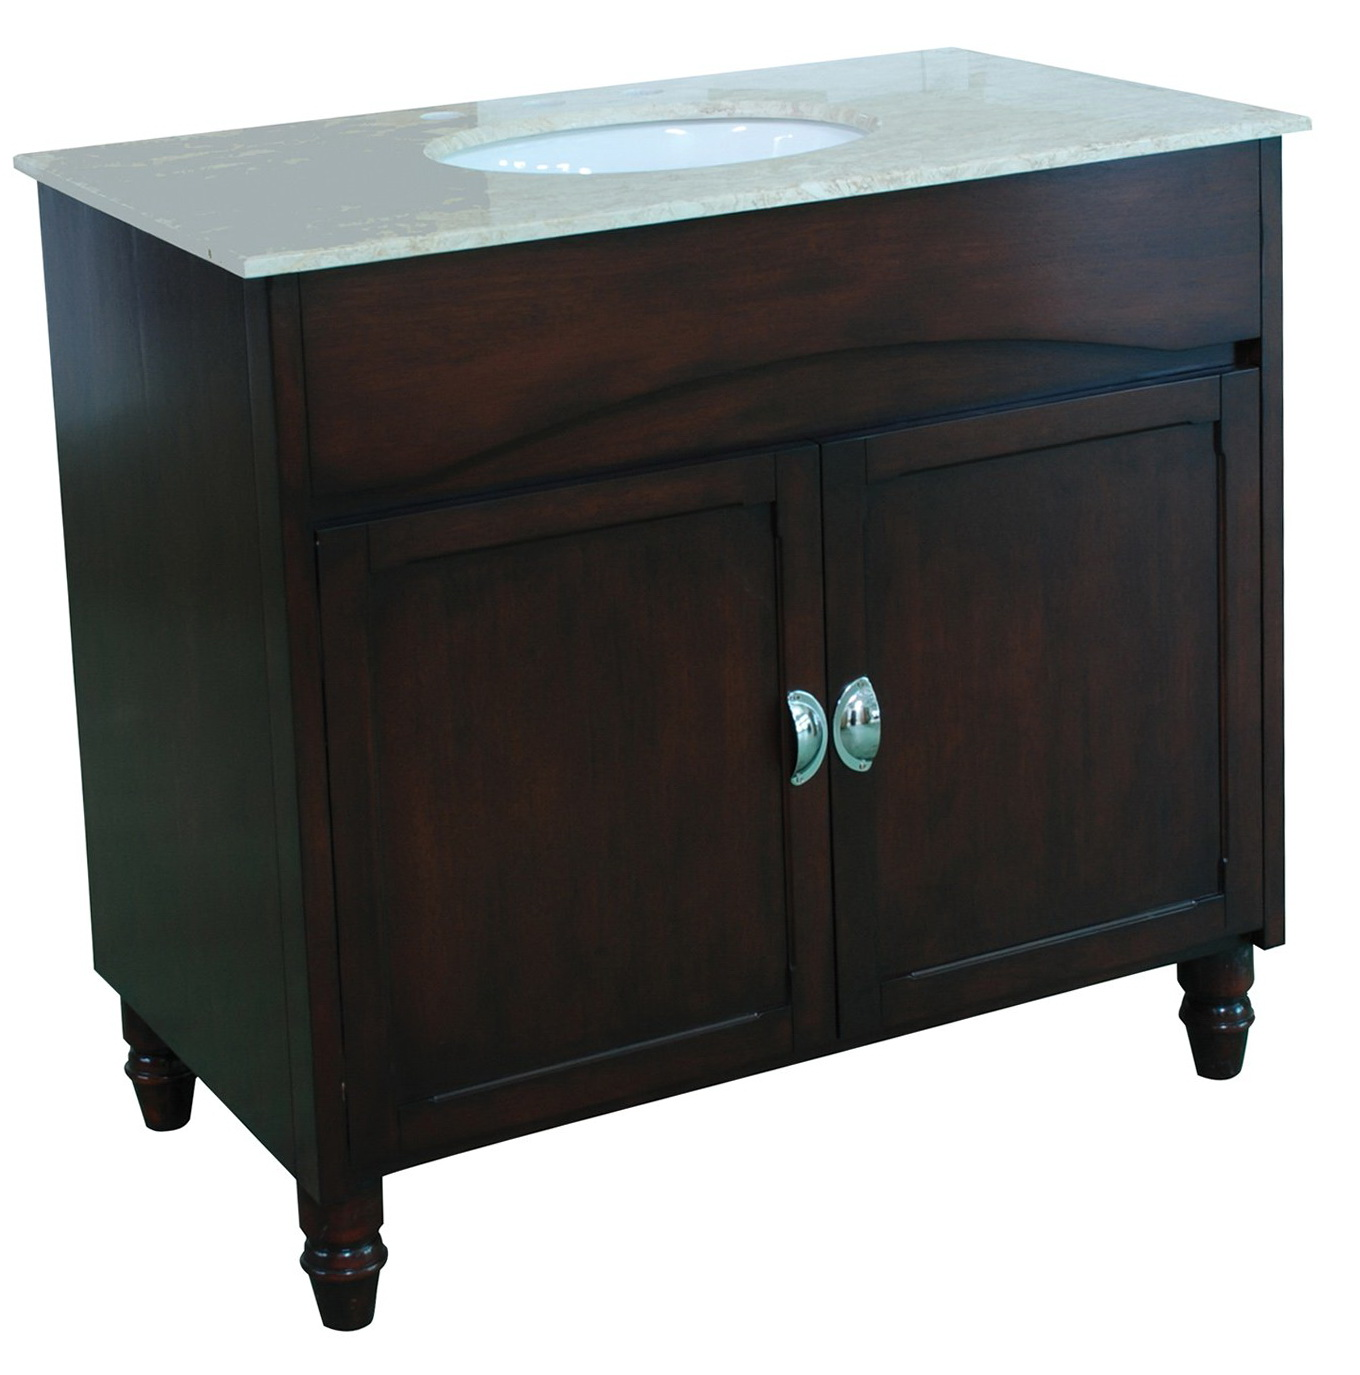 36 Inch Bathroom Vanity Countertop